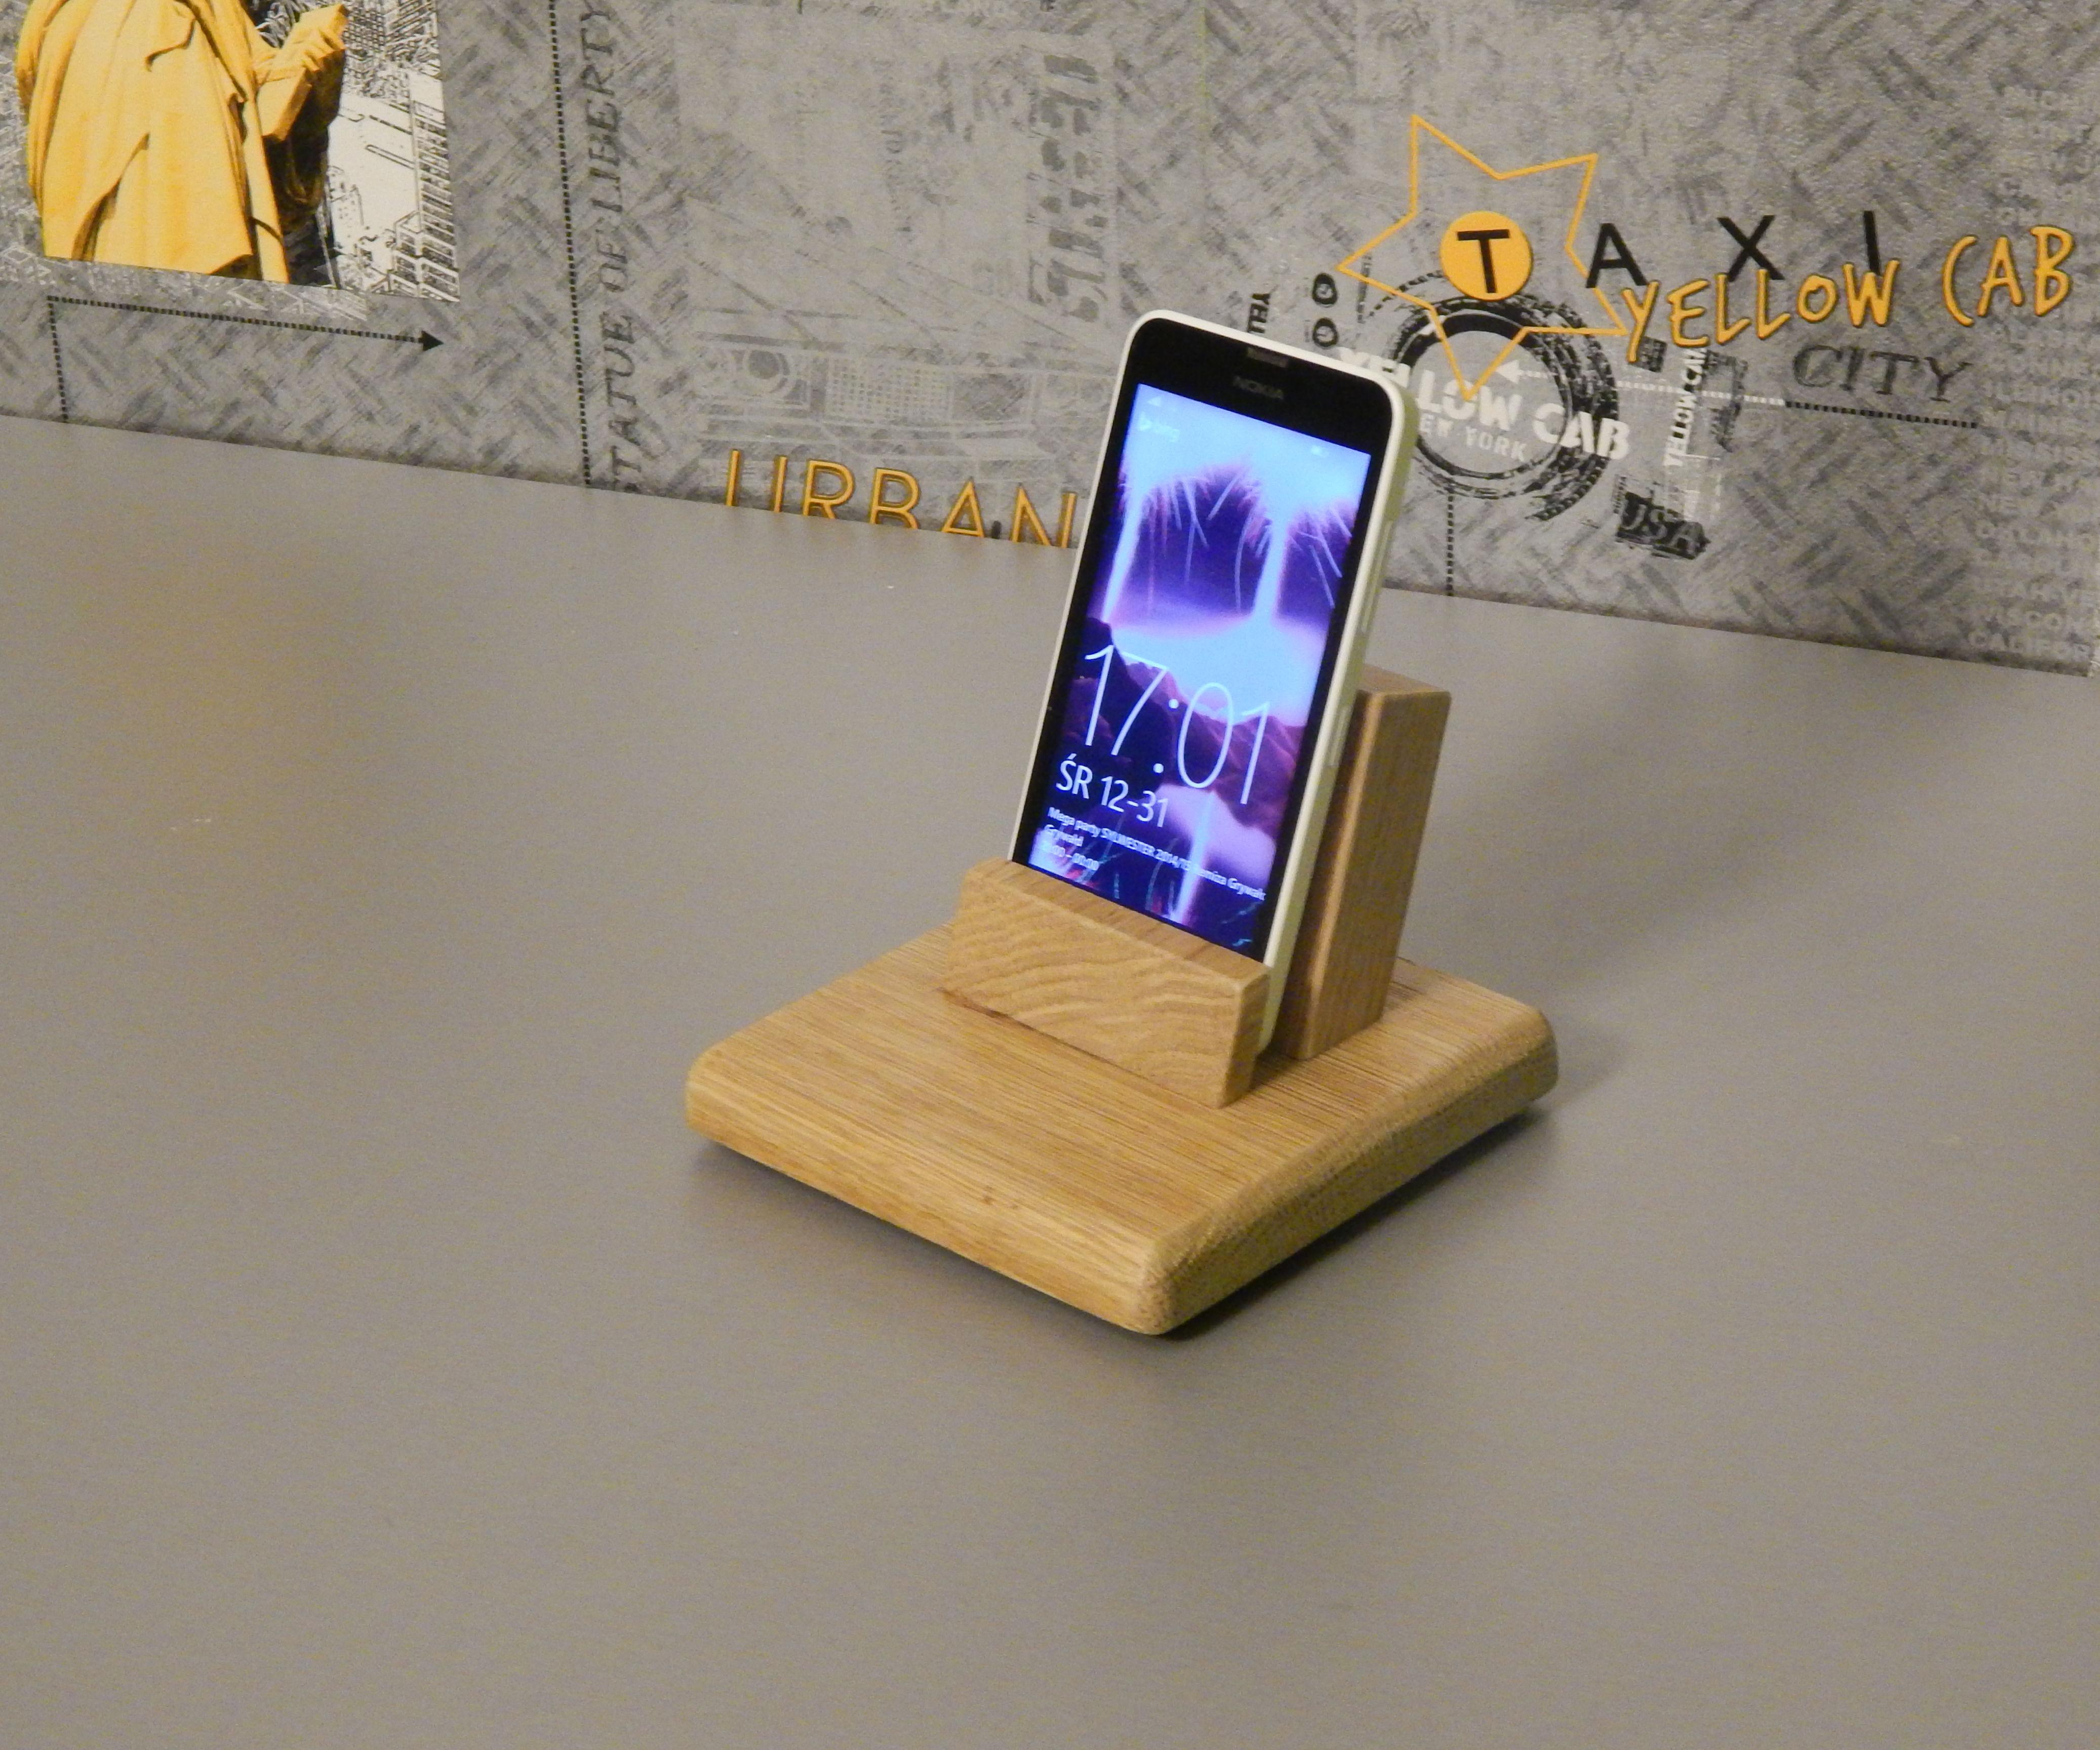 Easy to make smartphone dock